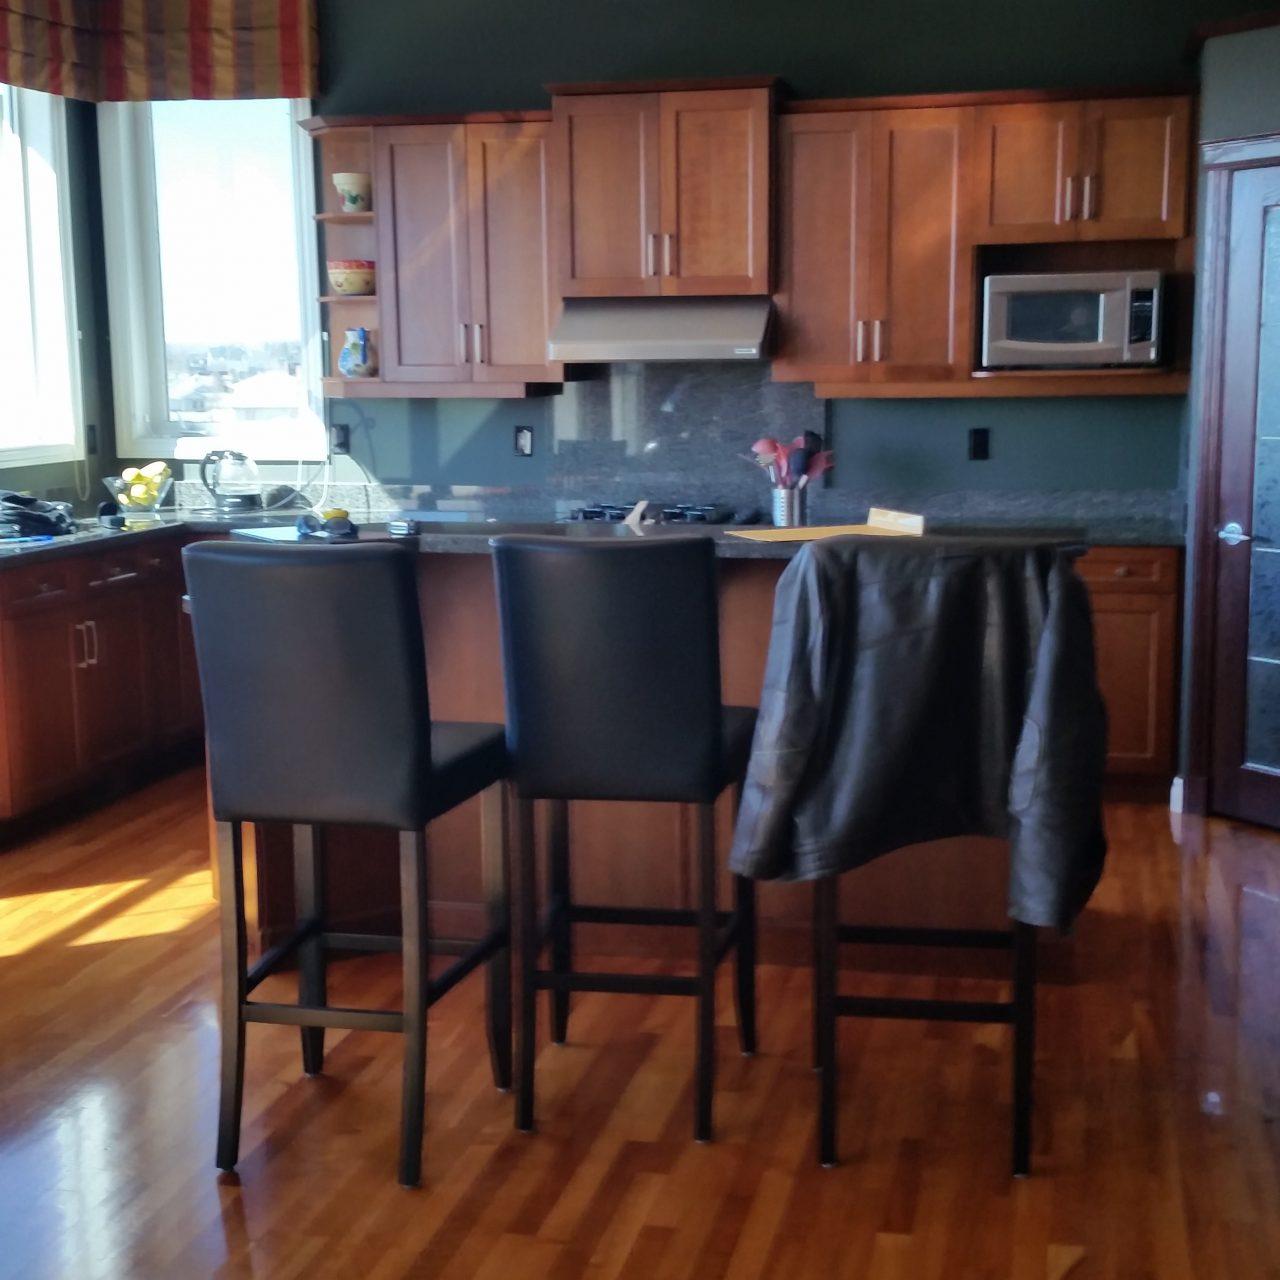 https://artisankitchens.ca/wp-content/uploads/2018/10/Artisan-Kitchen_before-1280x1280.jpg